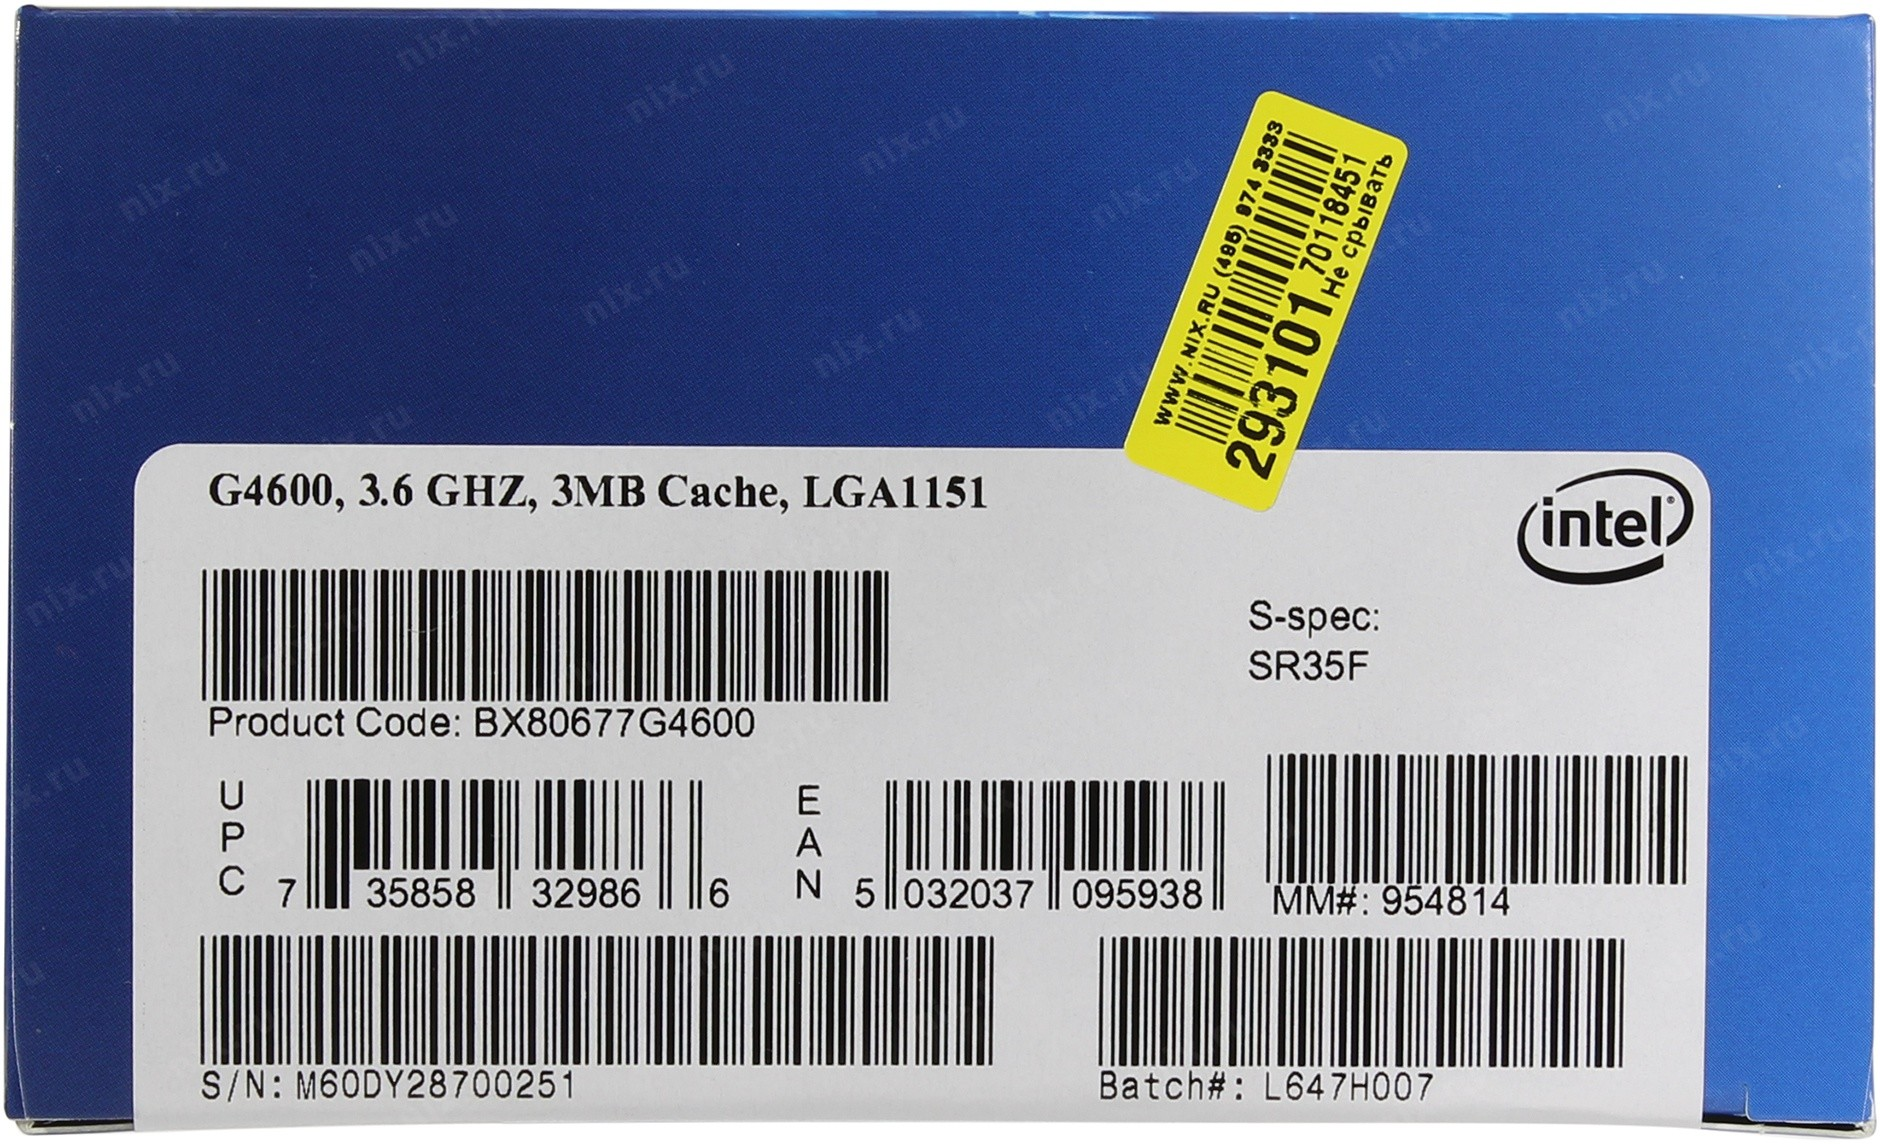 Intel Pentium Processor G4600 Box 36ghz Kabylake Socket 1151